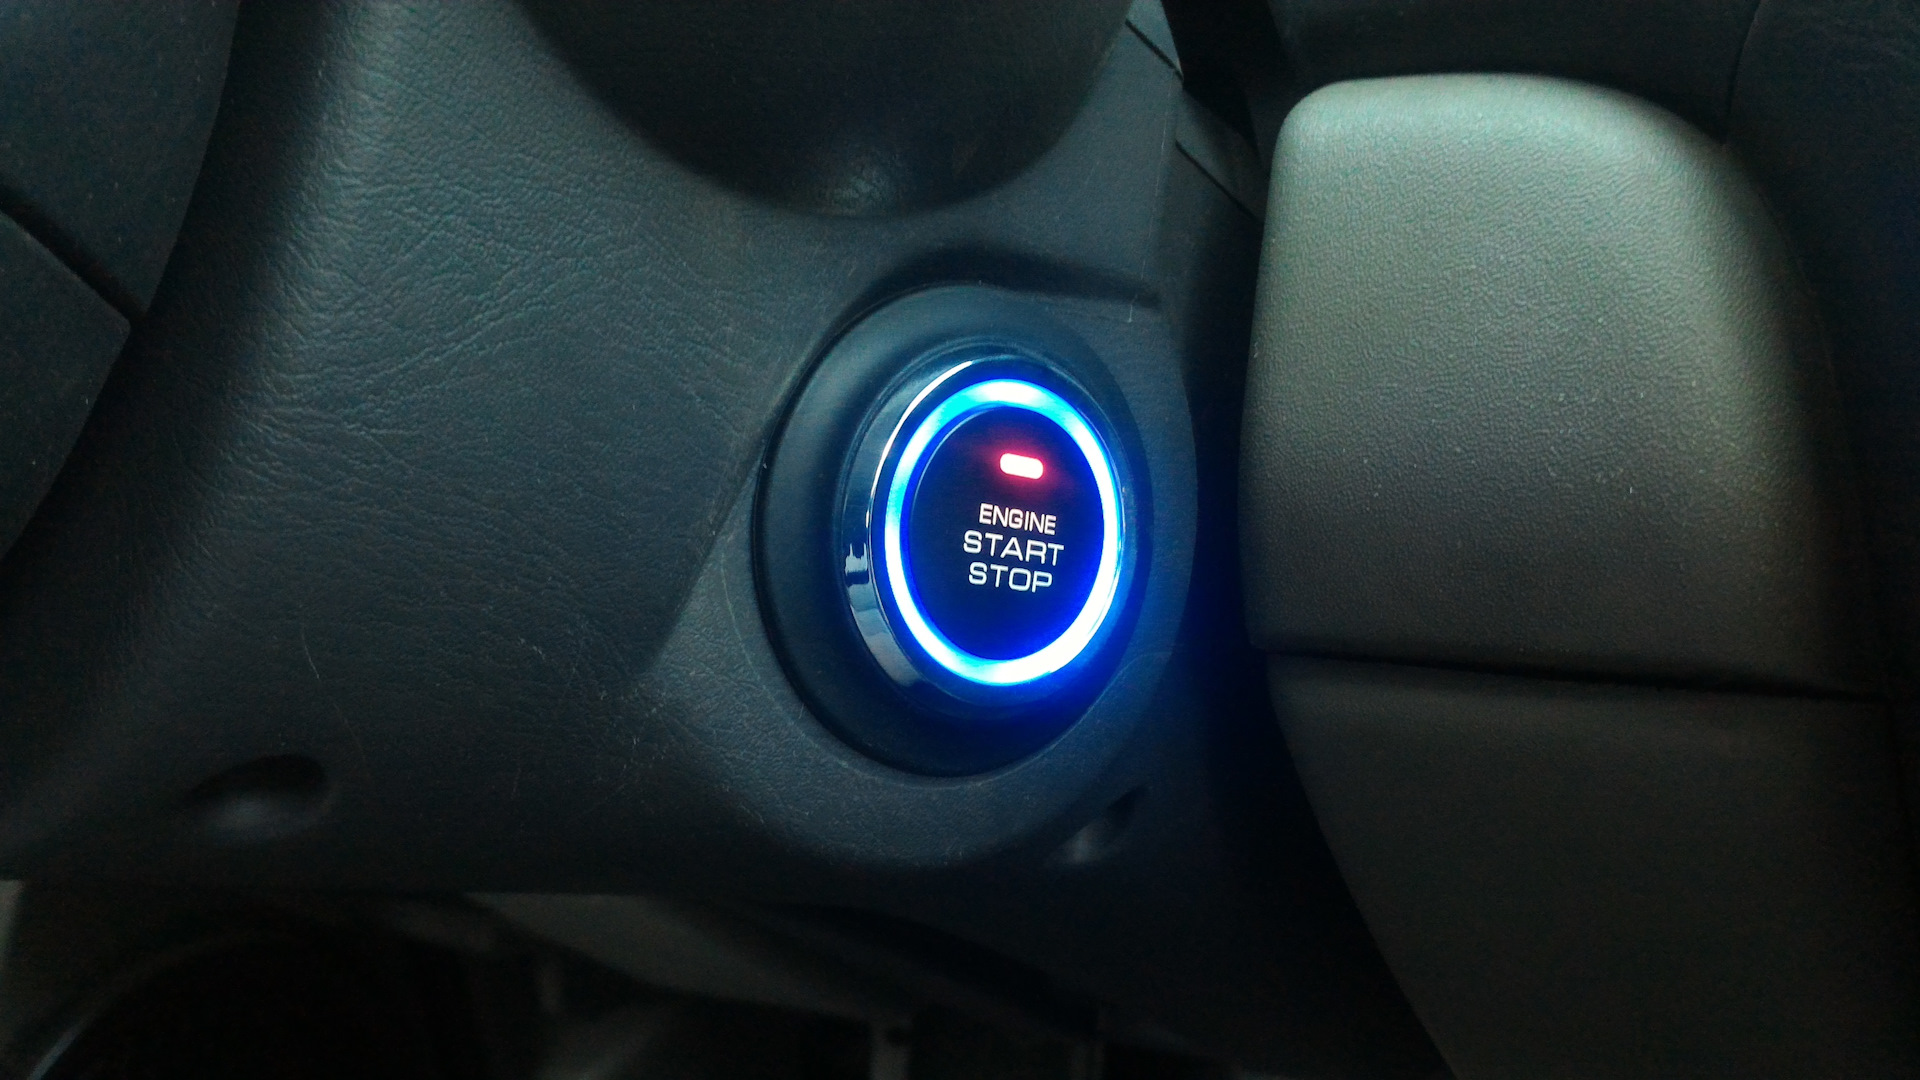 Кнопка старт на автомобиль своими руками